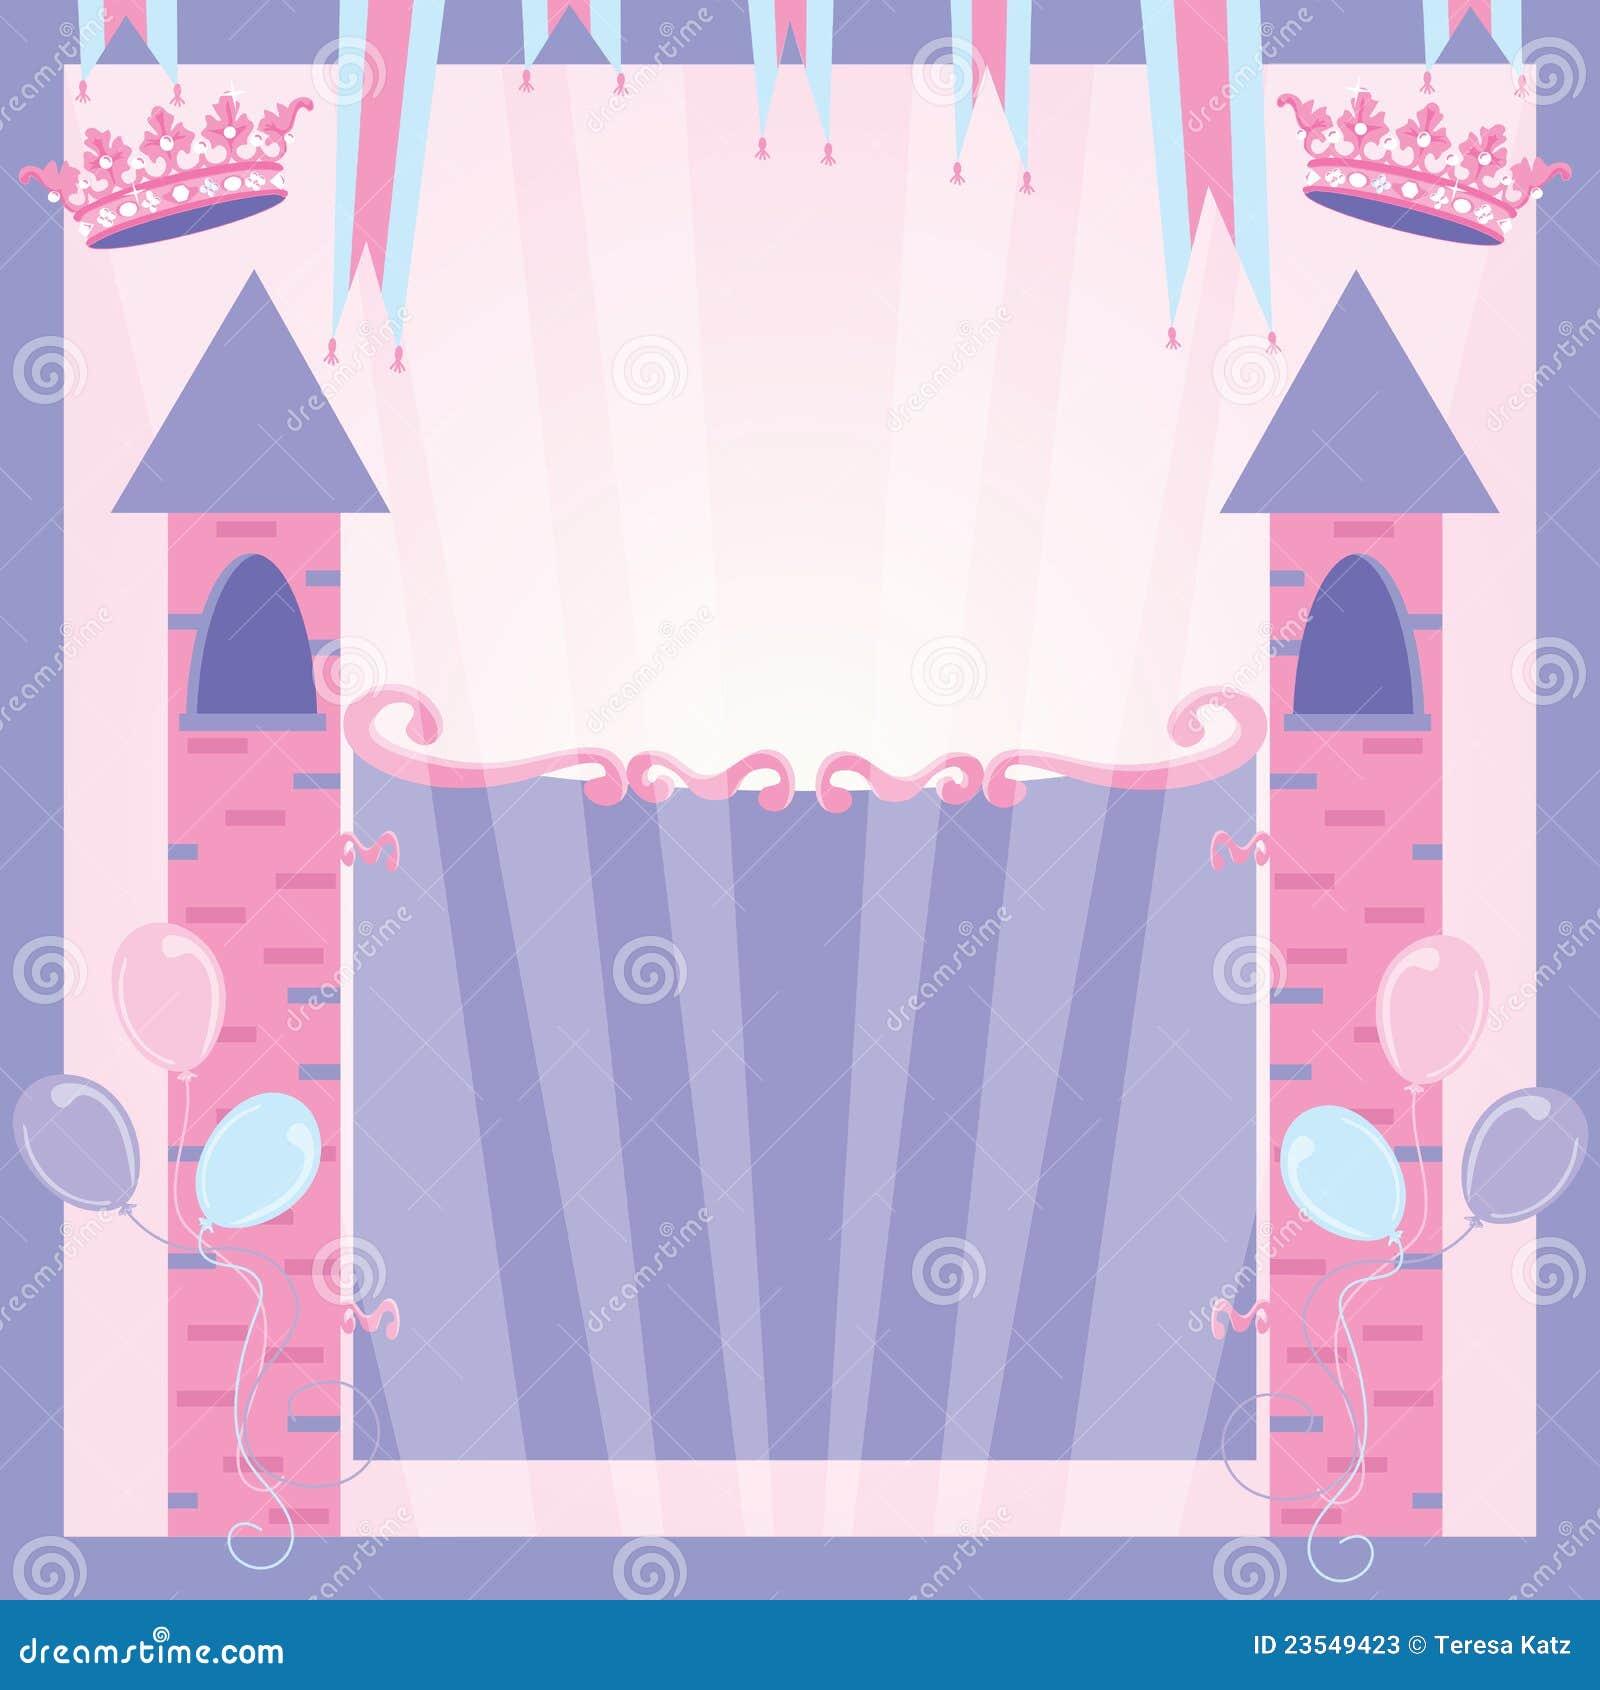 princess birthday party invitation castle stock photos  image, Birthday invitations